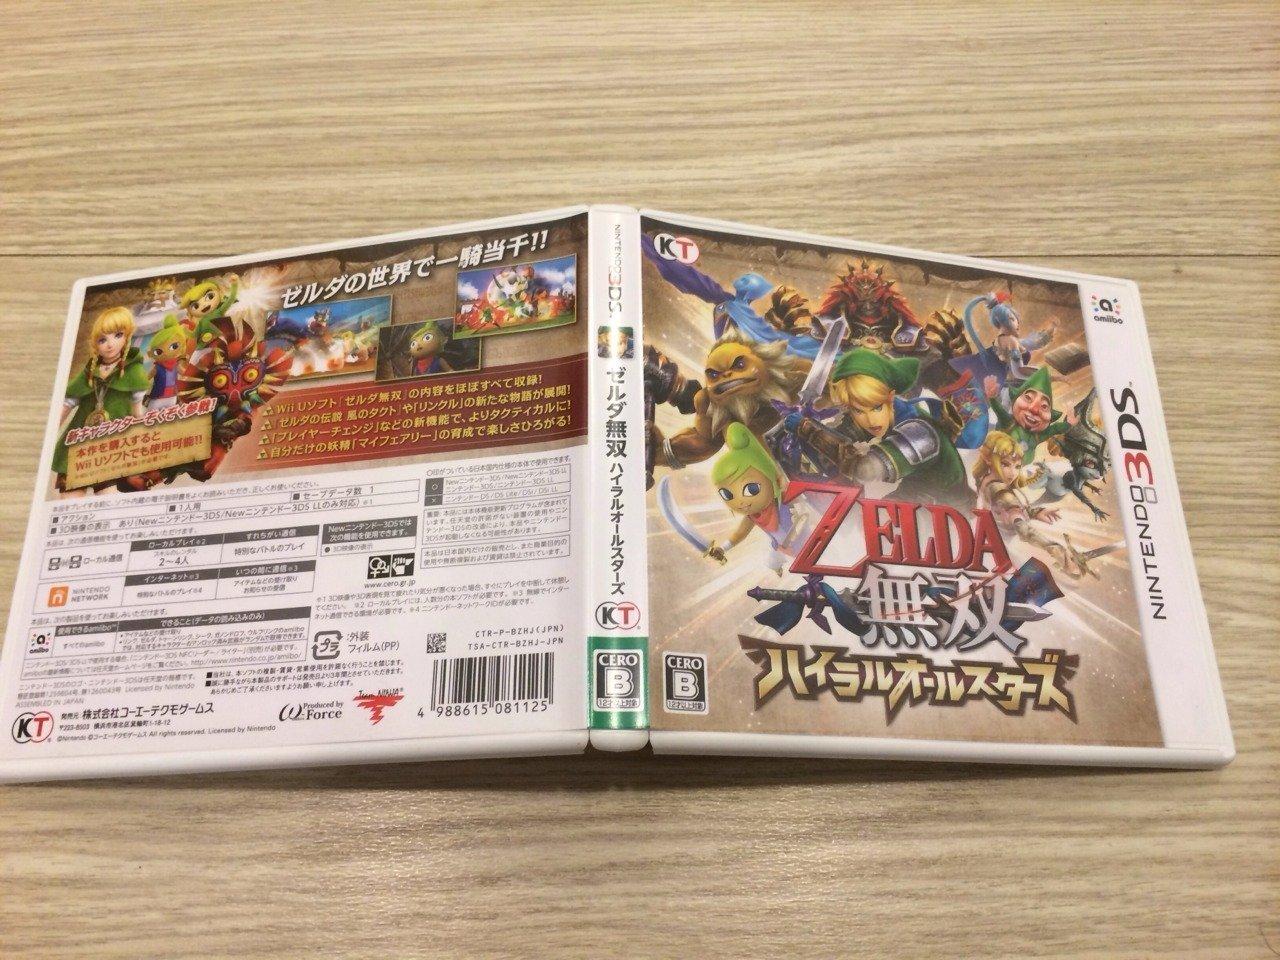 N3DS 3DS 薩爾達 ZELDA 薩爾達無雙 海拉魯群星集結 Zelda Warriors 售1250